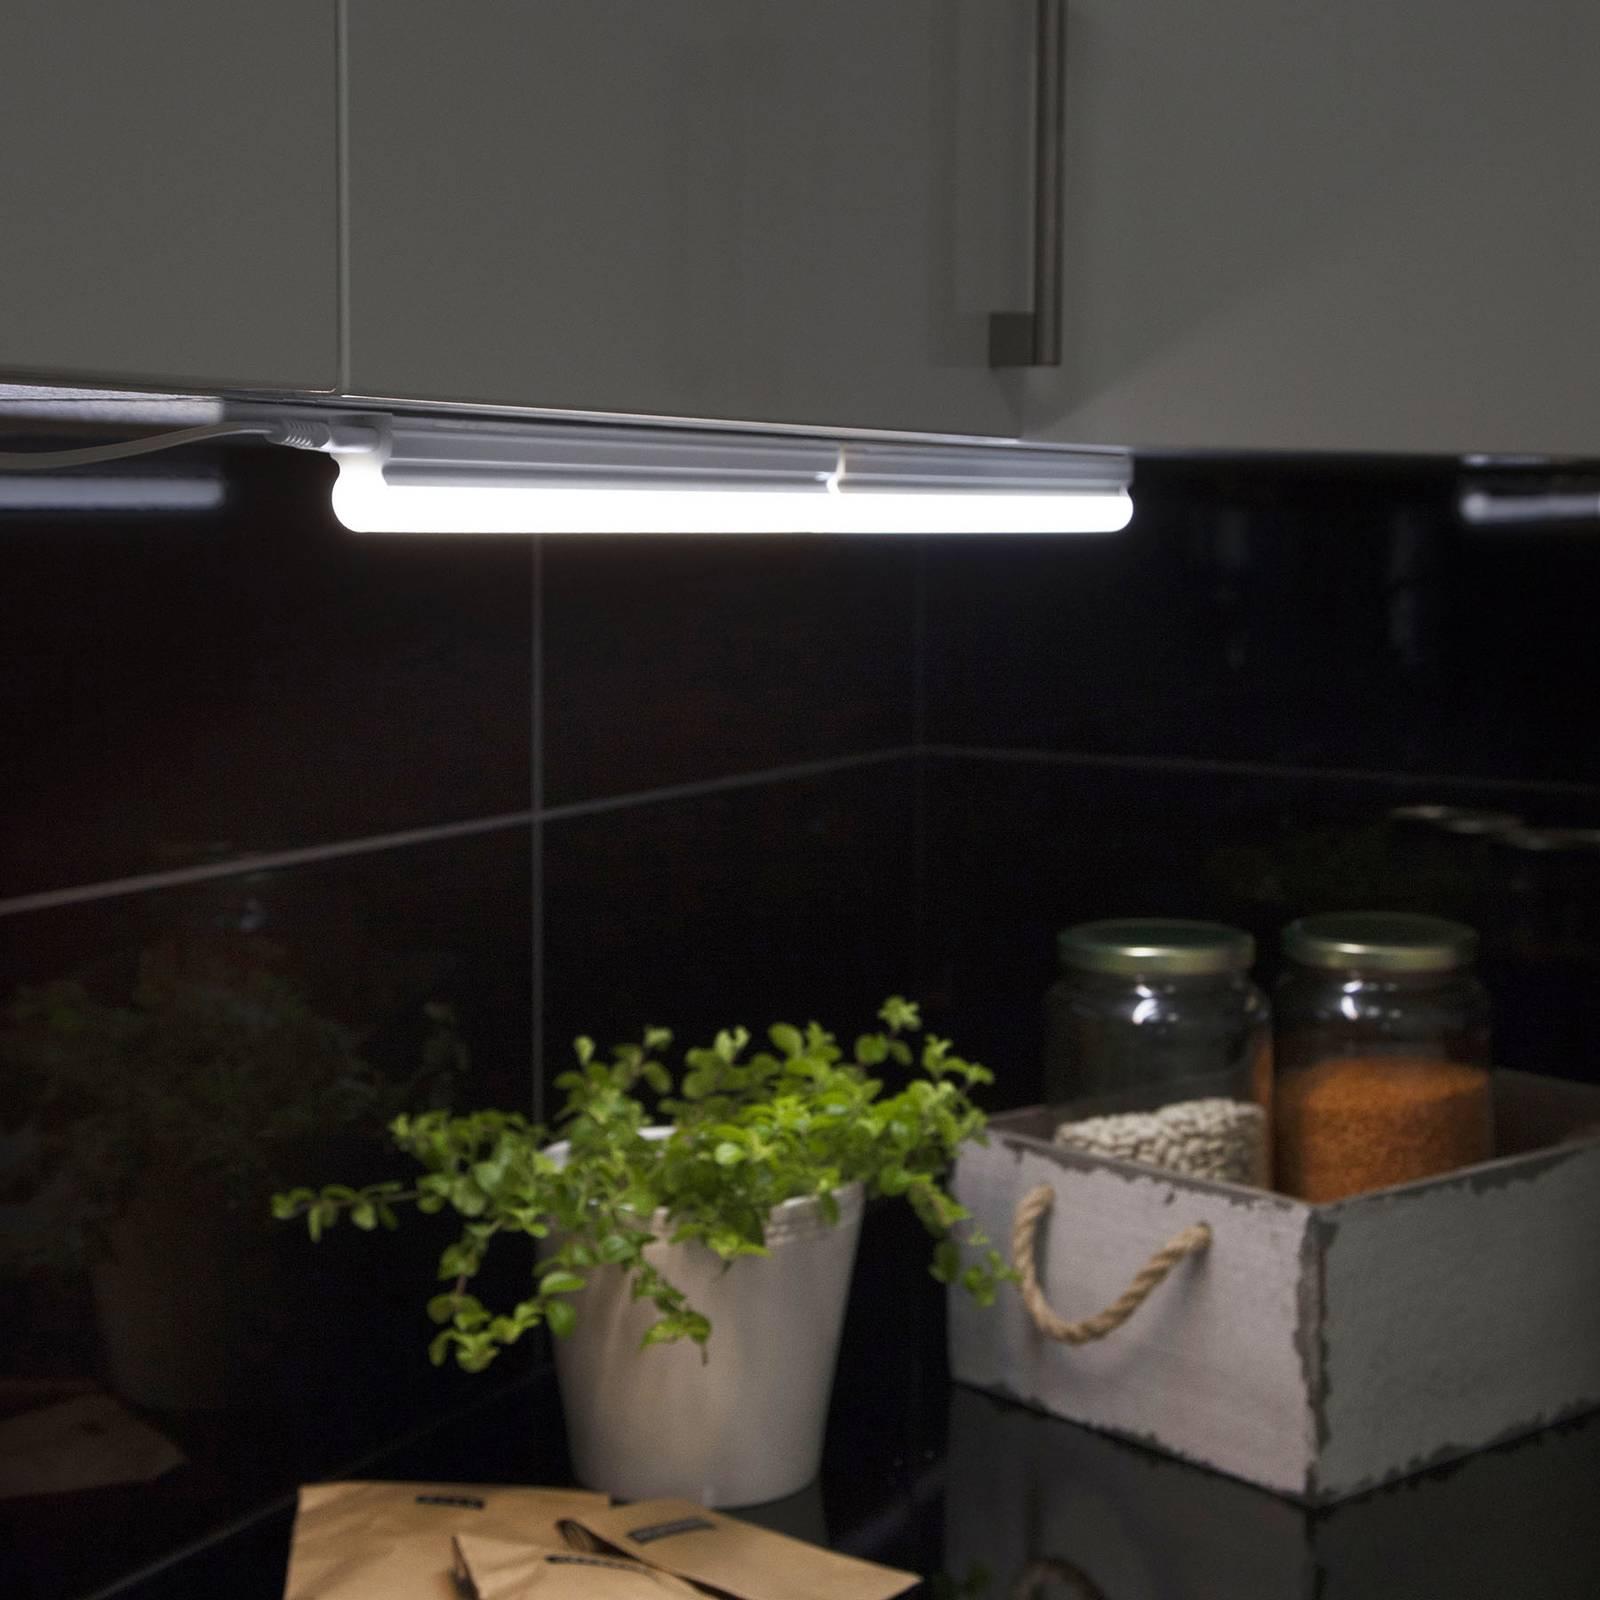 LED-kaapinalusvalaisin Cabinet Light 31 cm 4 000 K